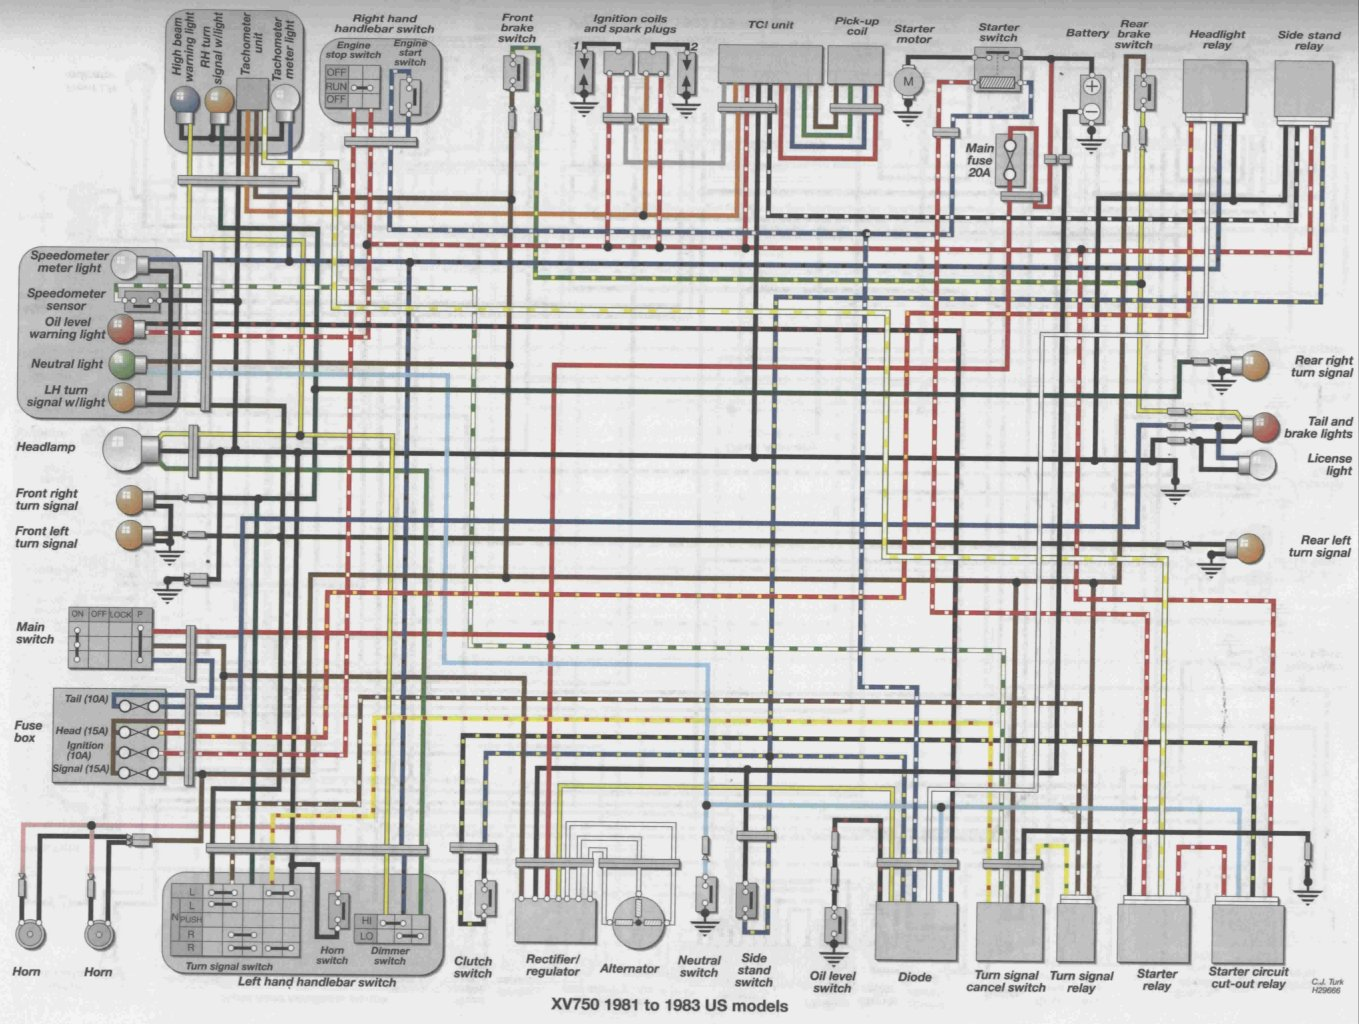 Electrical Problem Help Please Aprilia Tuono Wiring Diagram Re